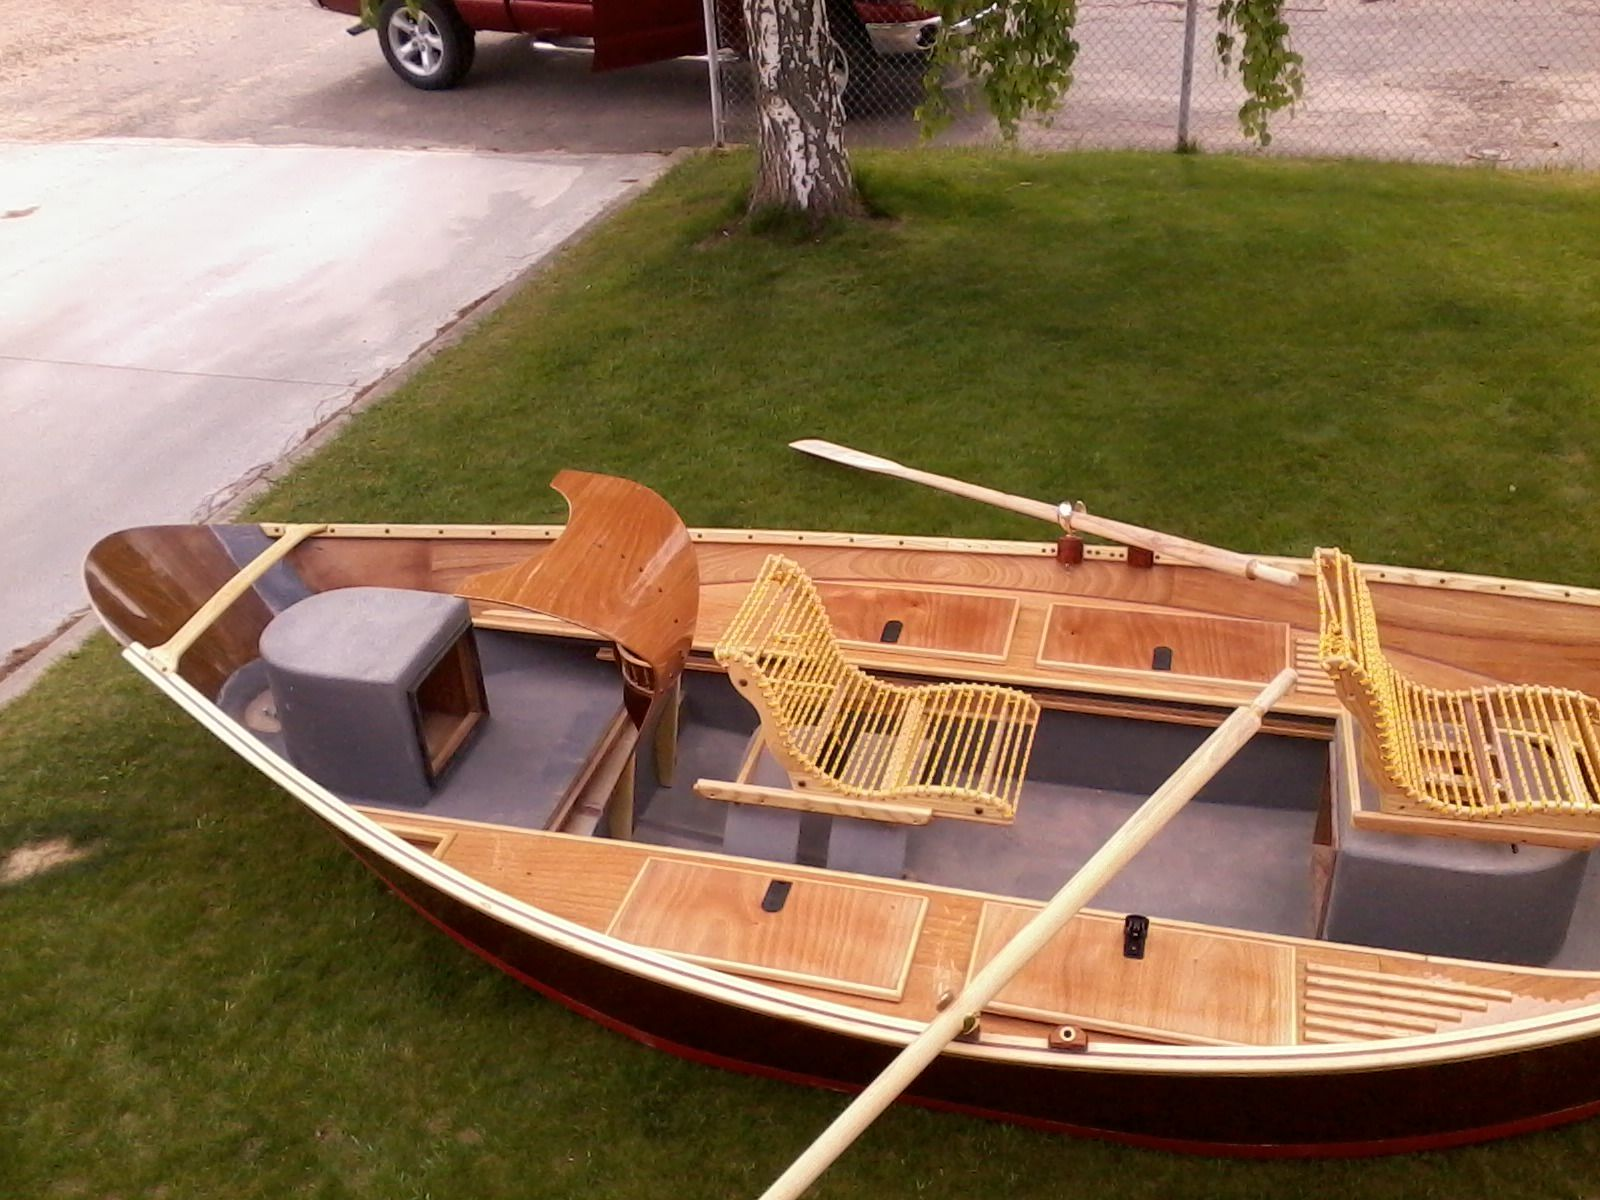 20 best drift boat build images on pinterest boat building boat